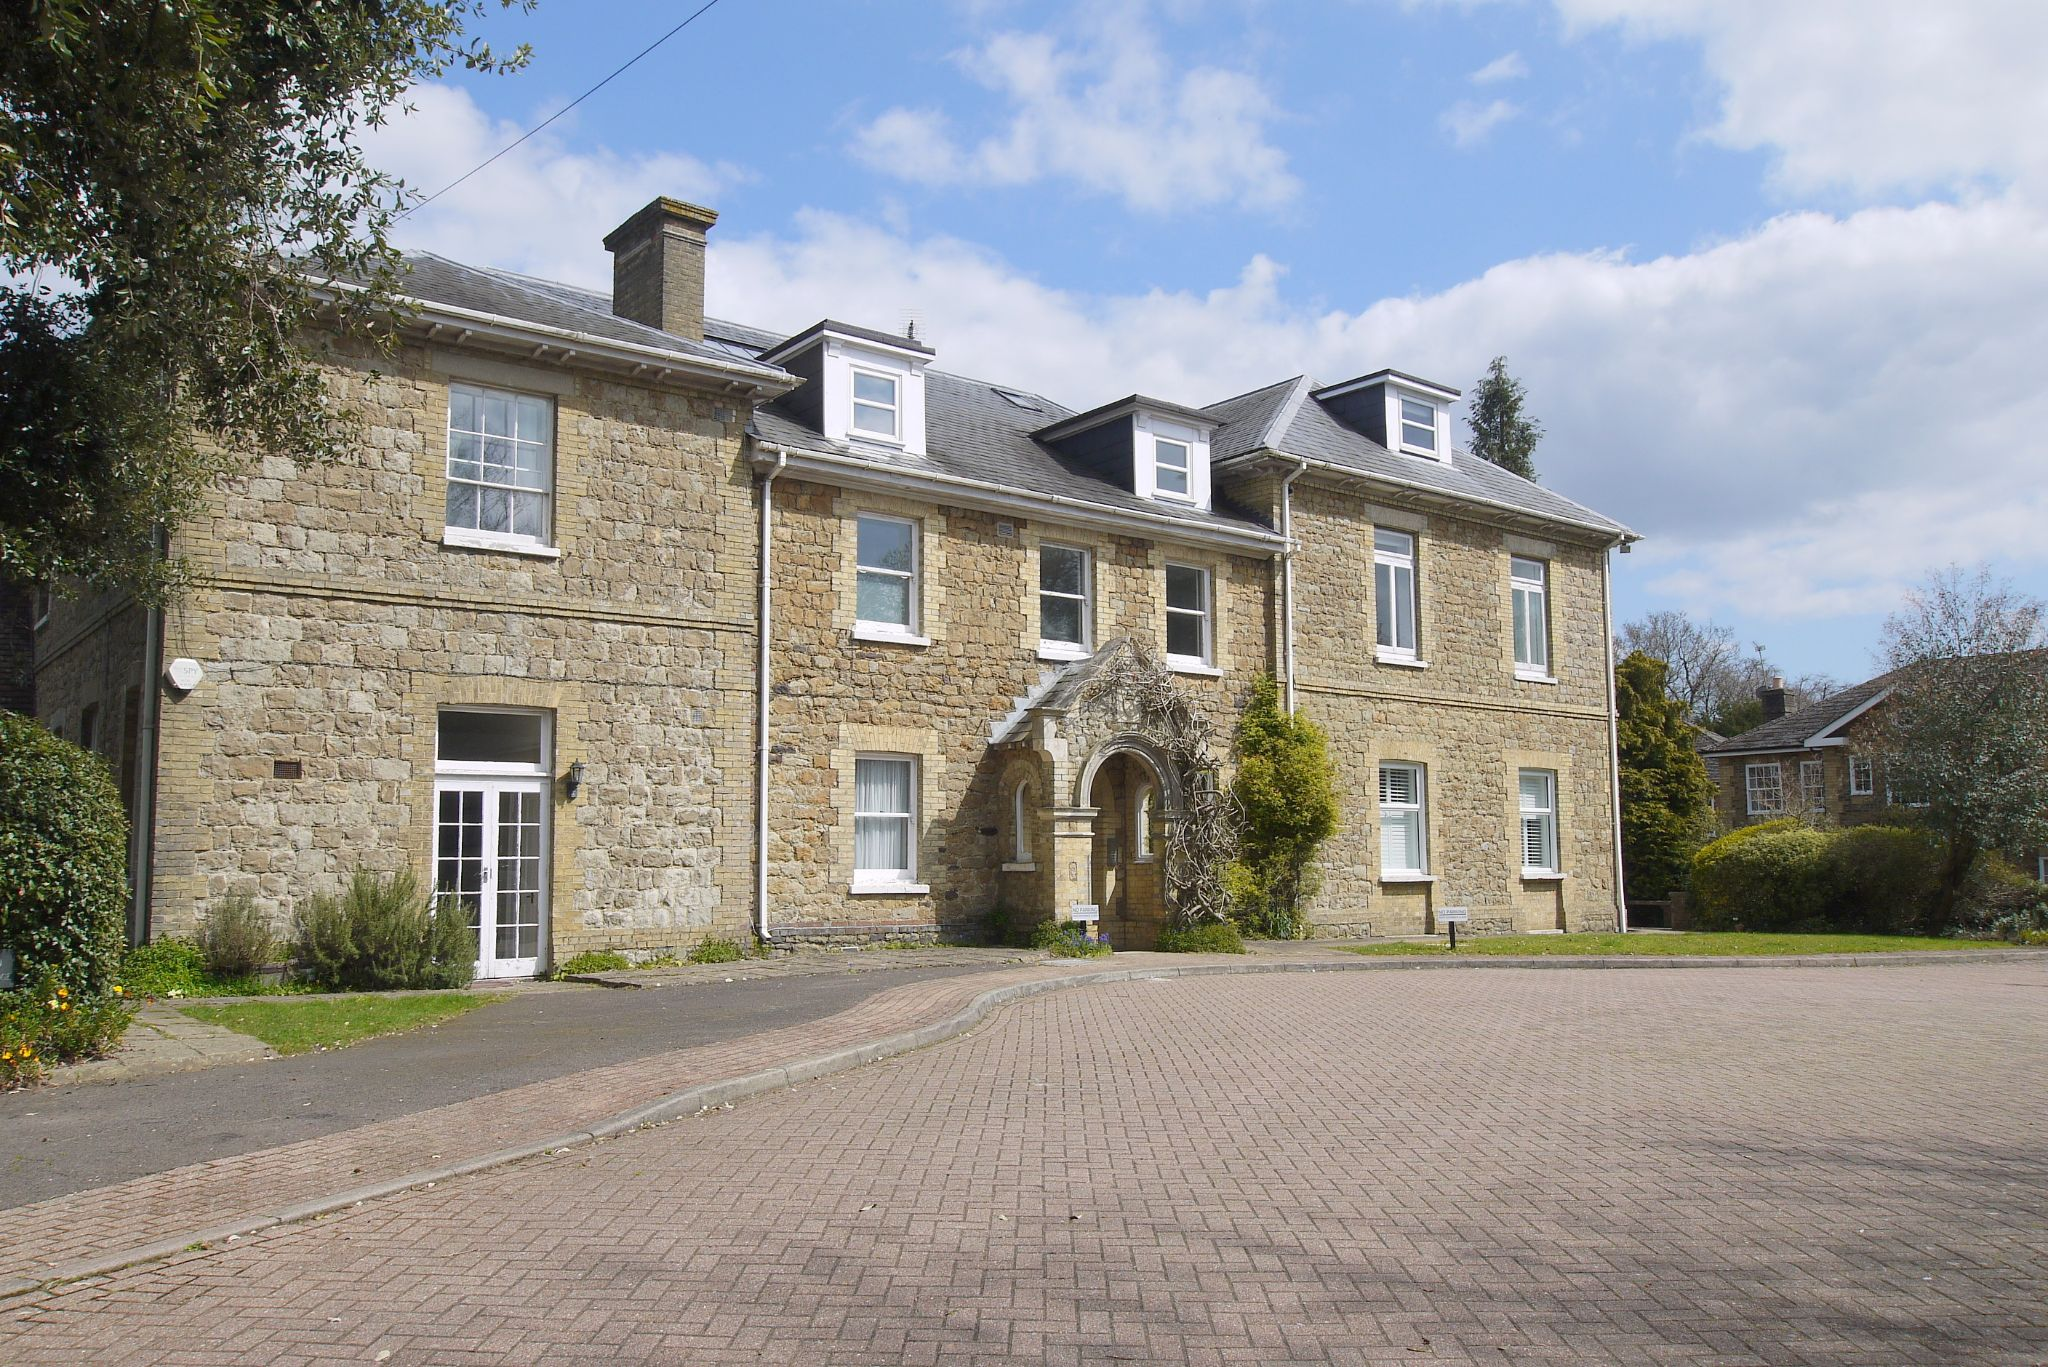 3 bedroom apartment For Sale in Sevenoaks - Photograph 1